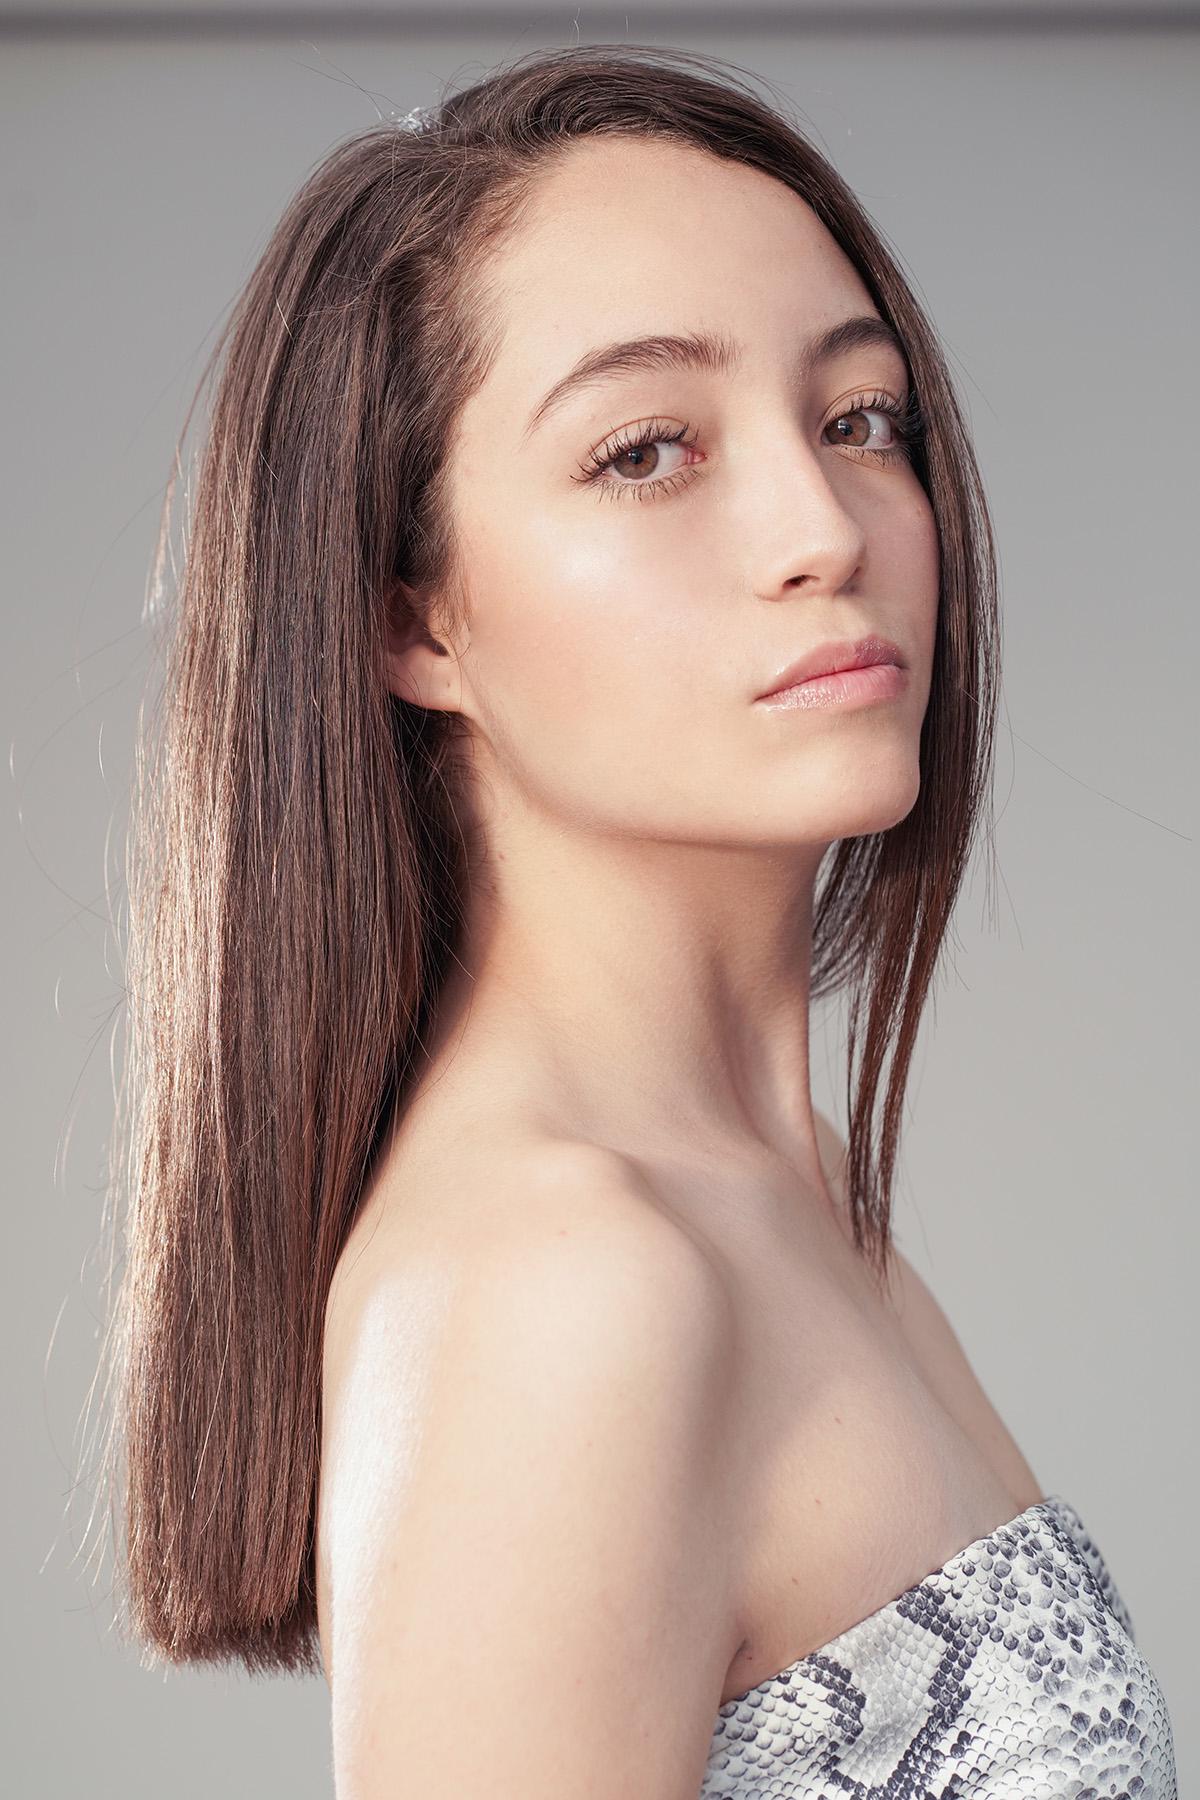 ELIZABETH HUERTA